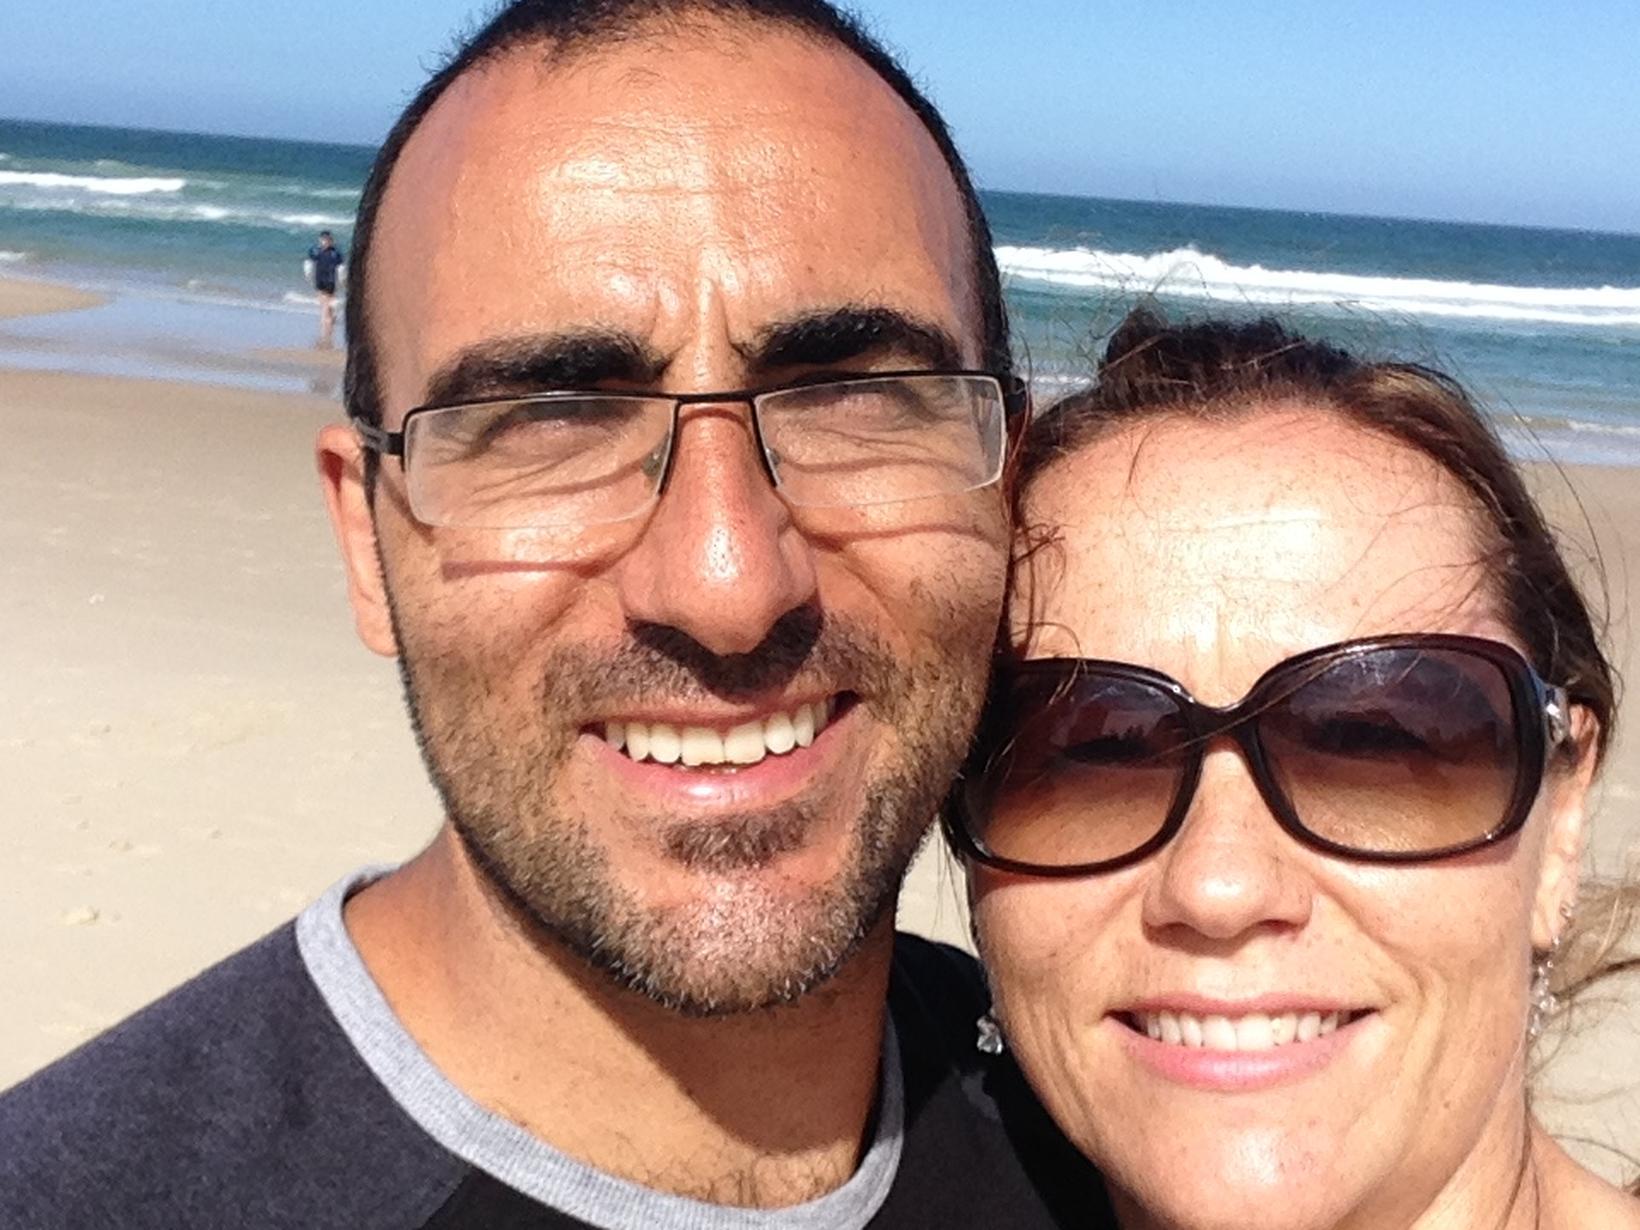 Sharon & Domenic from Gold Coast, Queensland, Australia